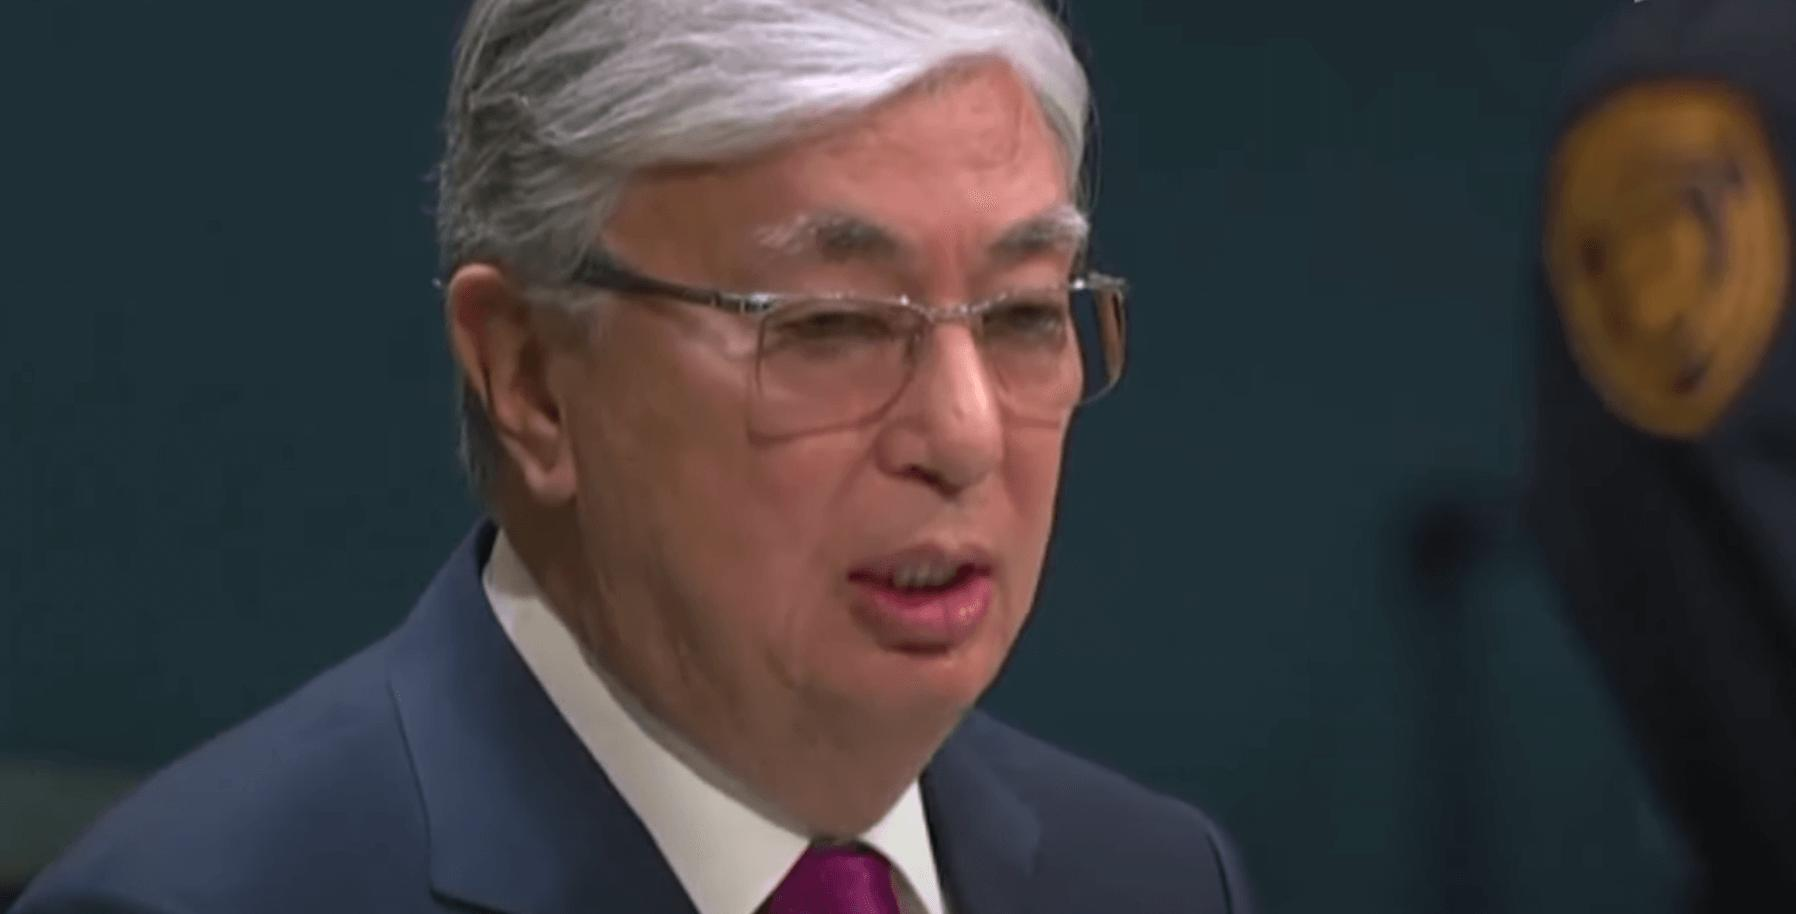 Выступление Токаева на Генассамблее ООН: тезисы президента